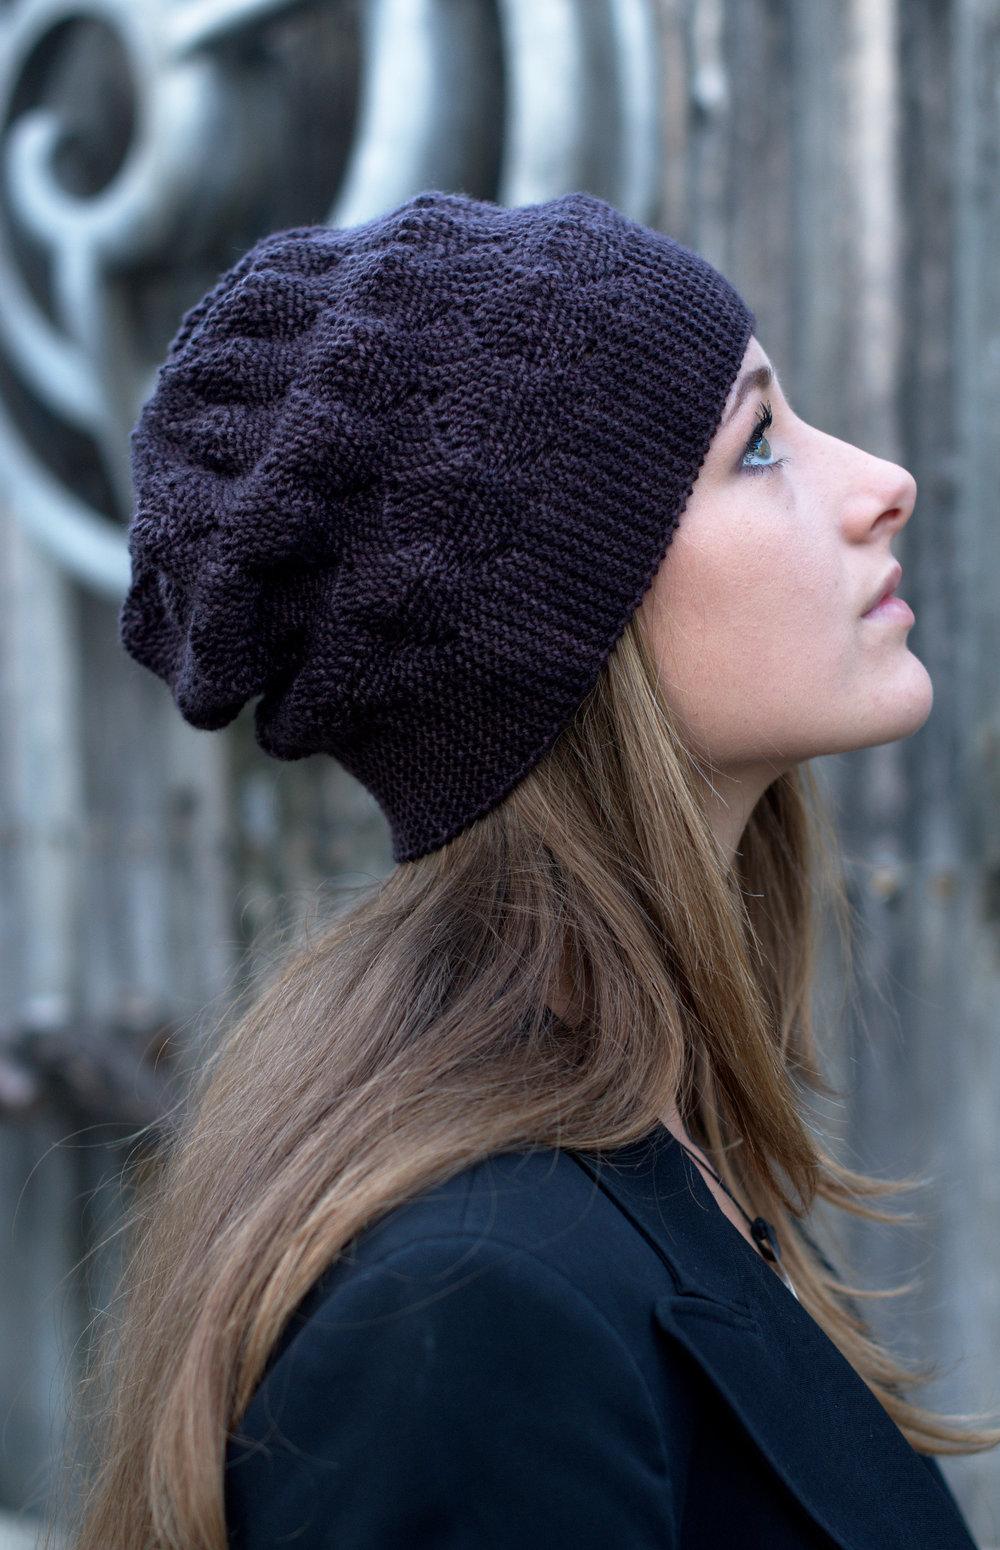 Sagitta sideways knit textured Hat knitting pattern